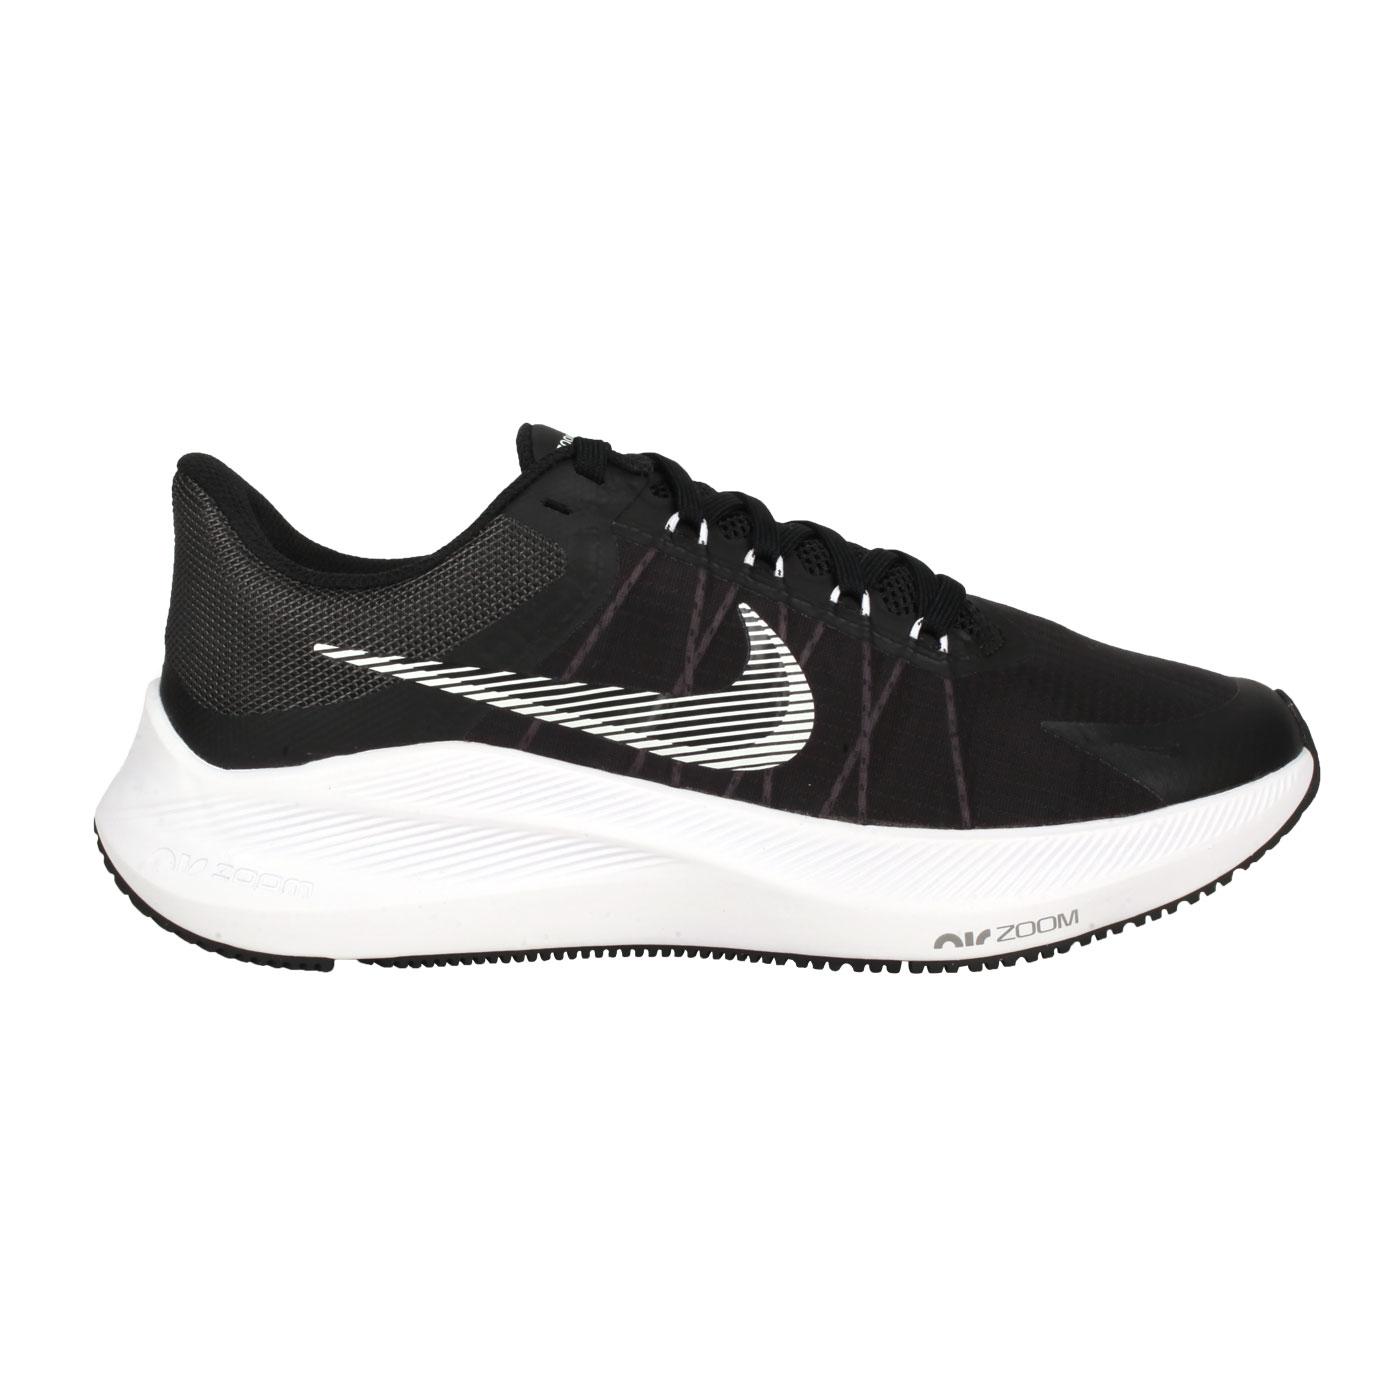 NIKE 女款休閒慢跑鞋  @WMNS WINFLO 8@CW3421005 - 黑白